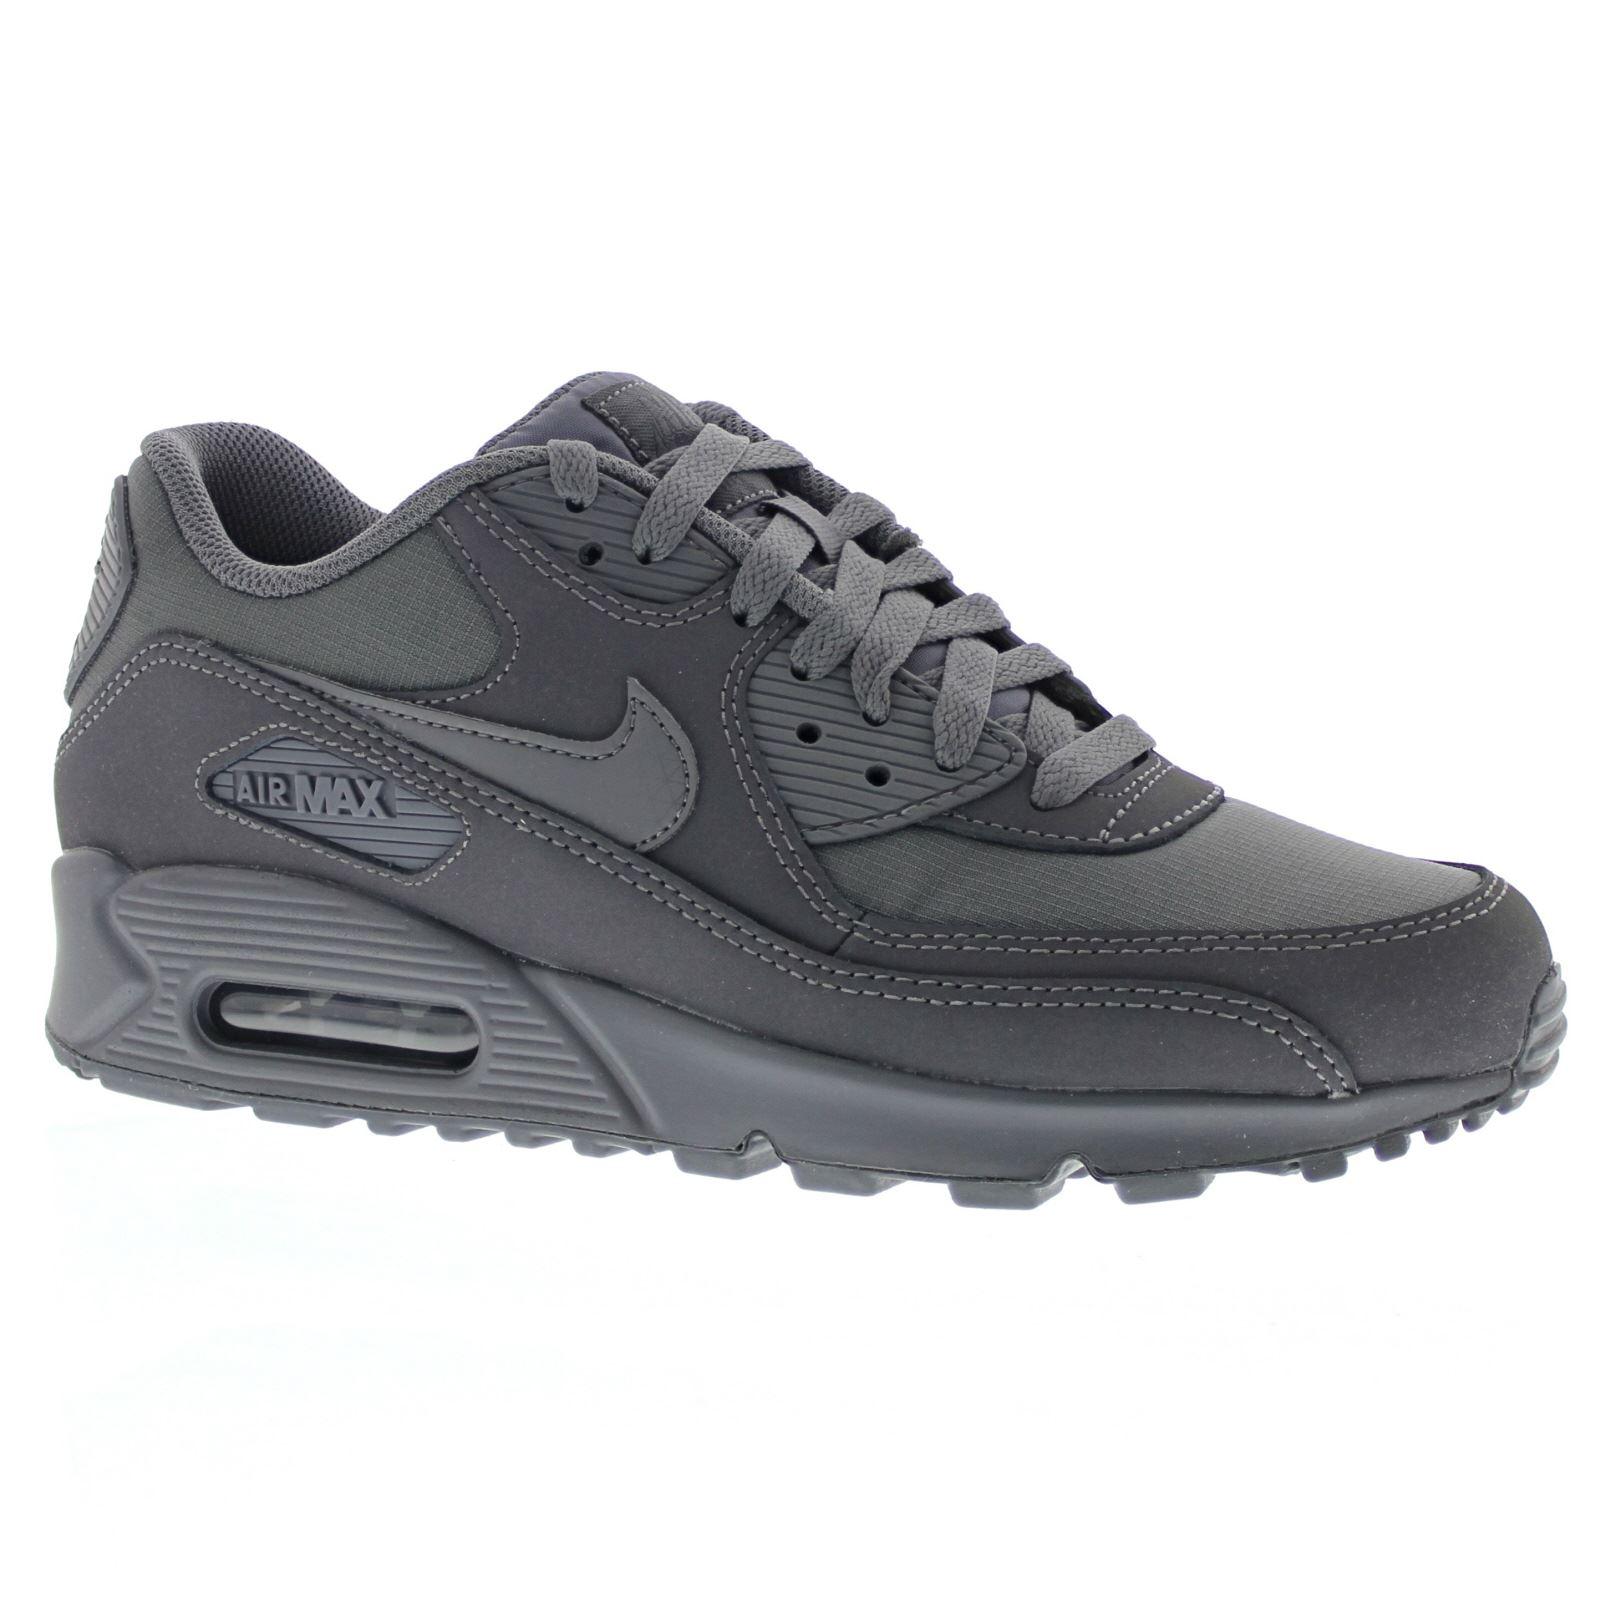 63de7232b956 ... Nike Air Max 90 Essential Dark Grey Mens Trainers - 537384-051 ...